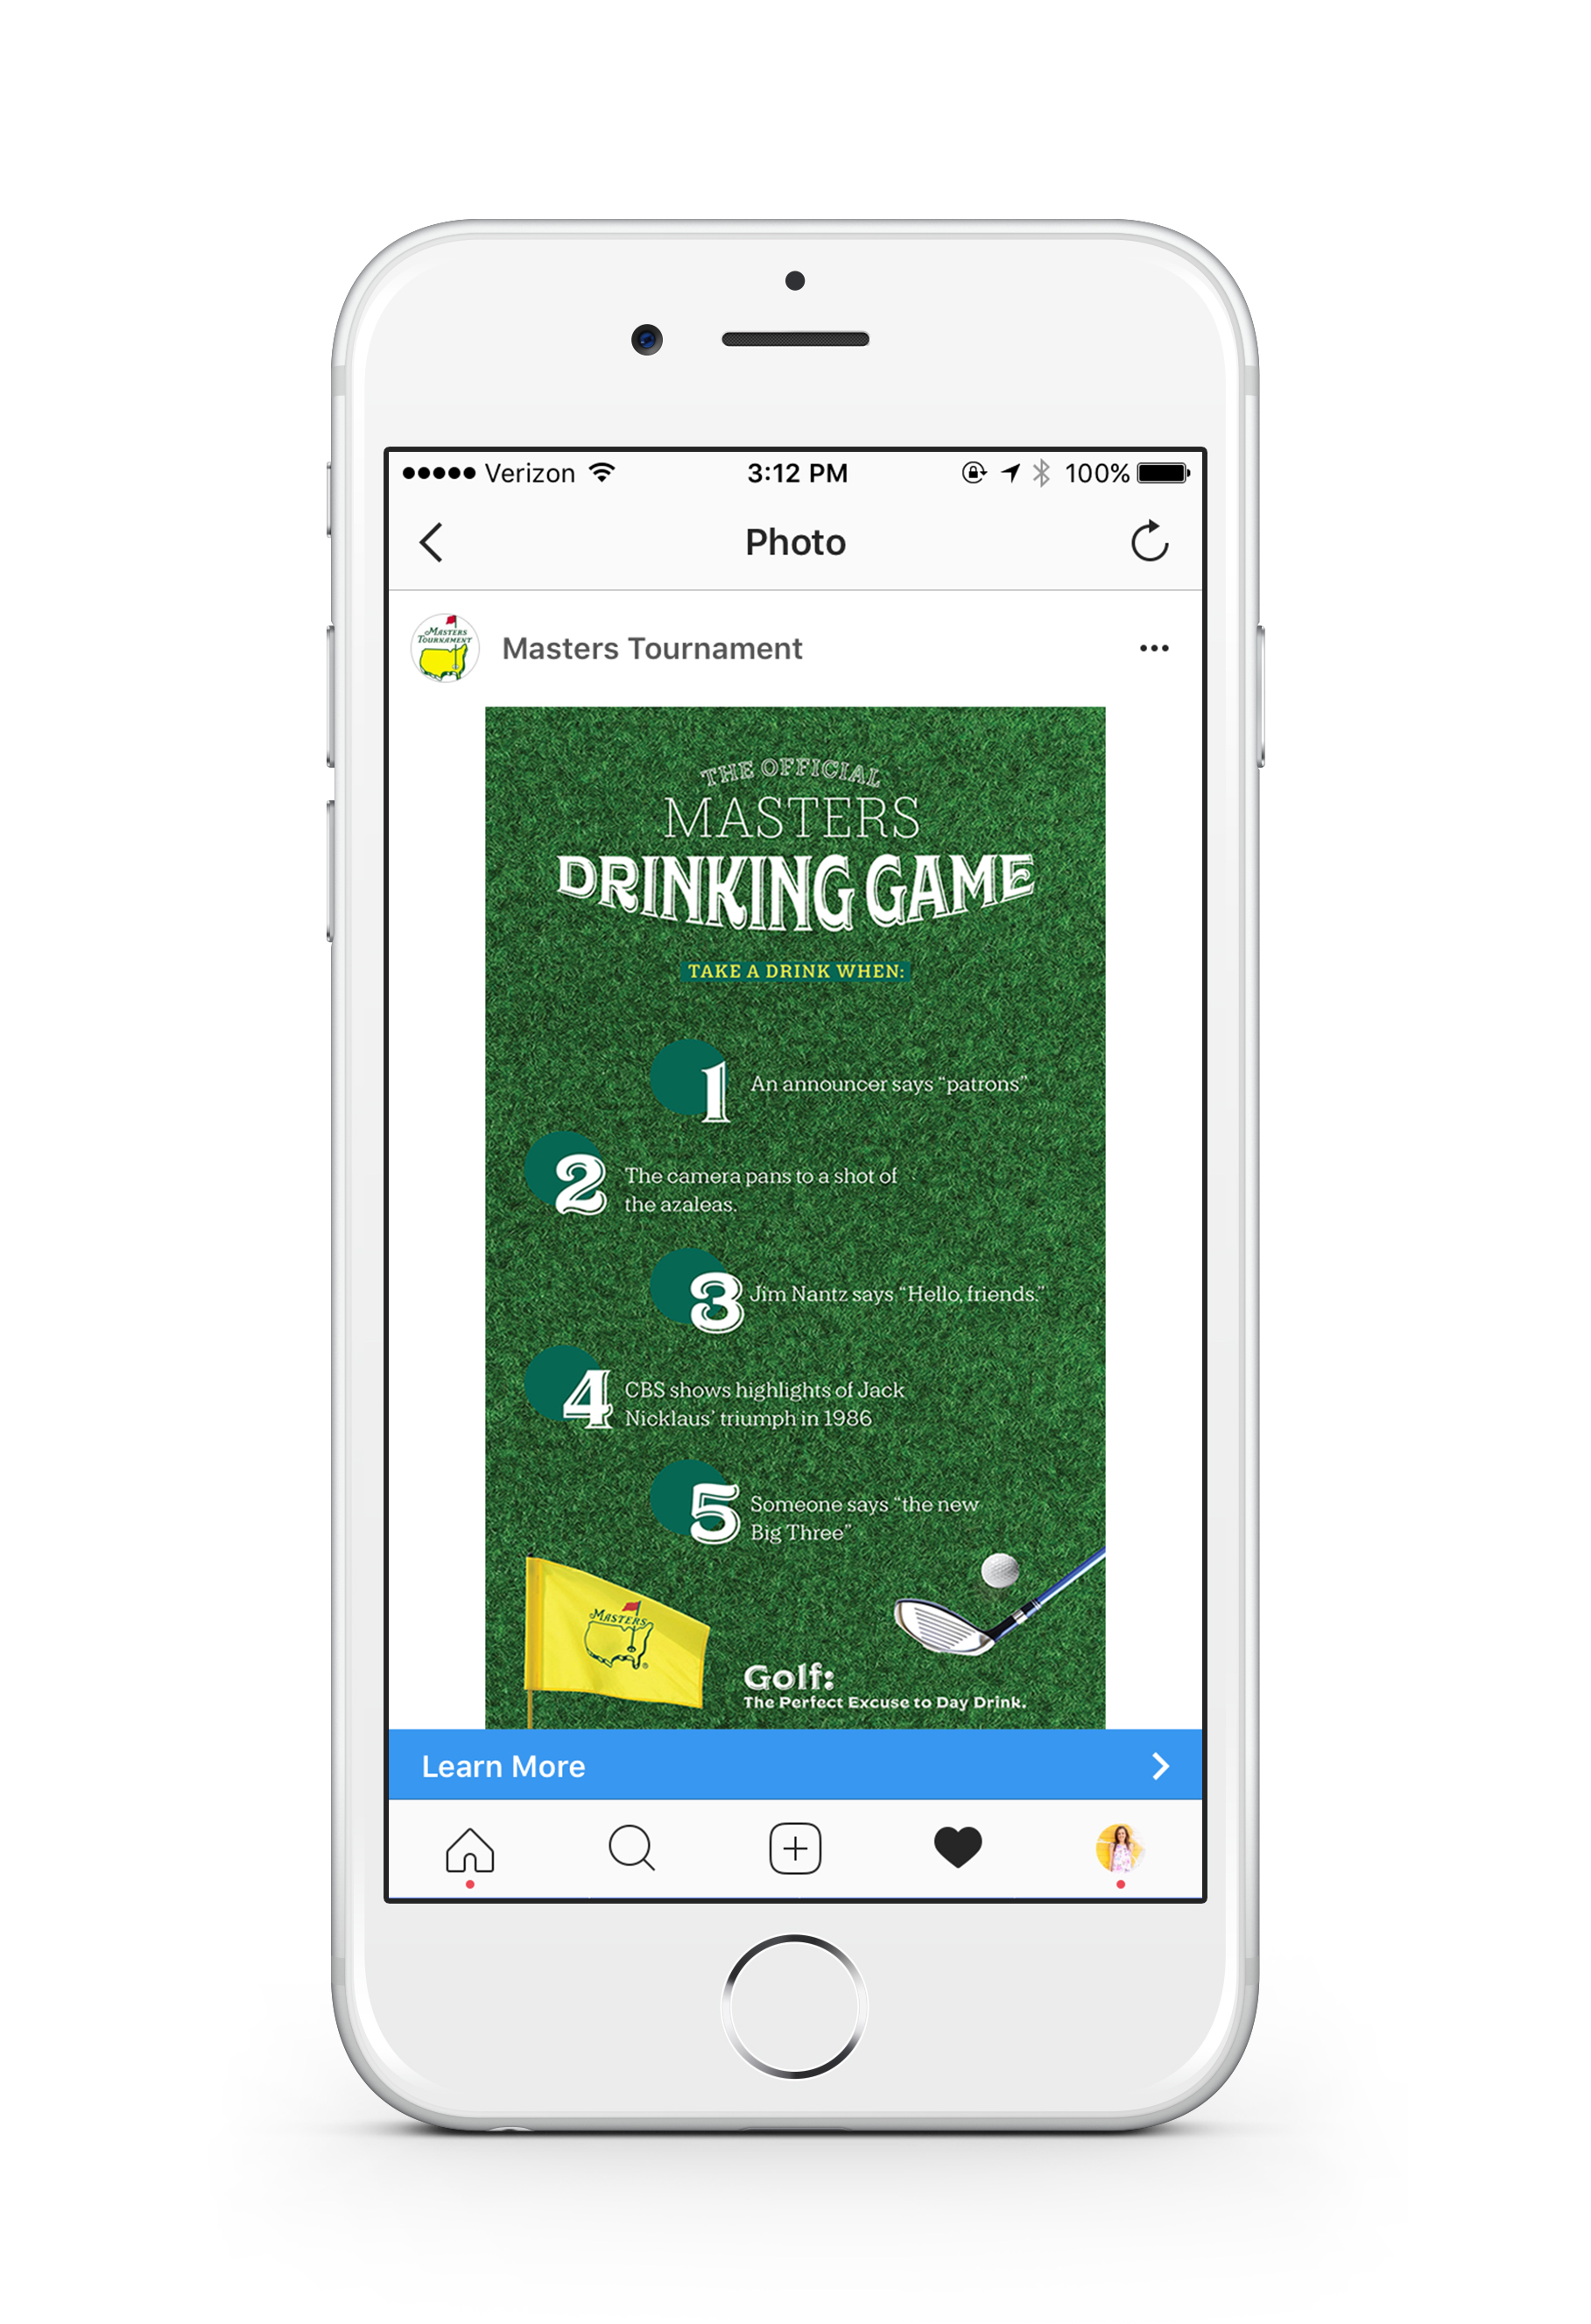 phonemockup_drinkinggame.jpg